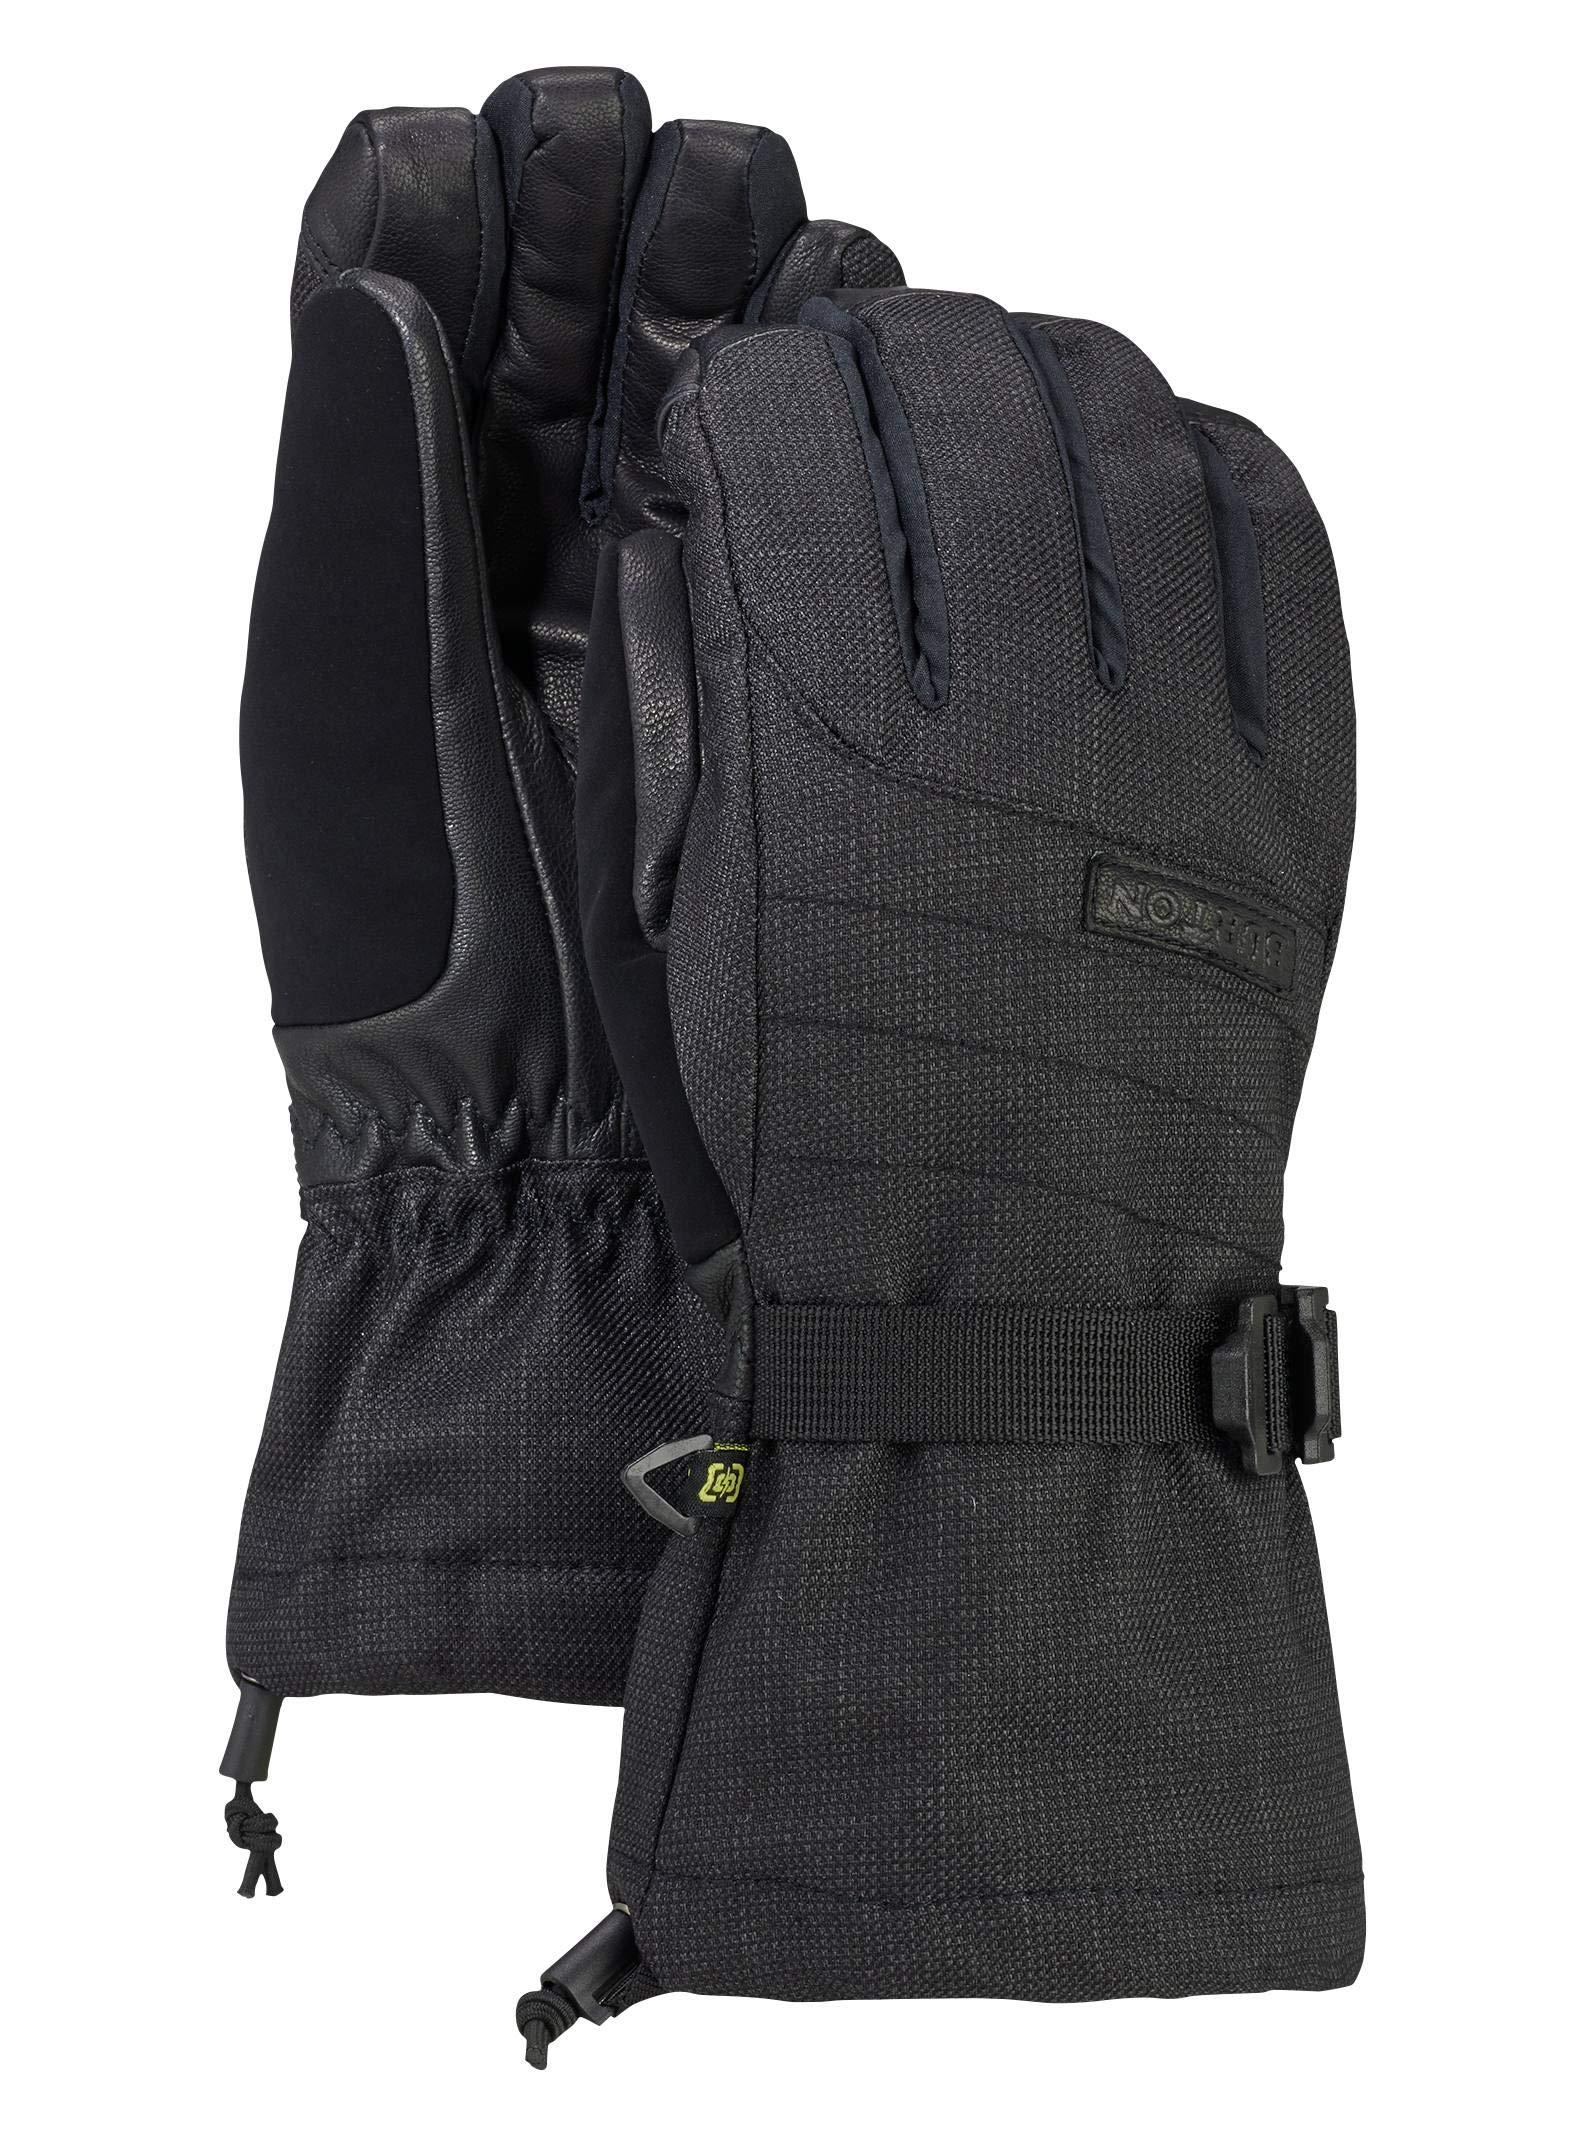 Burton Women's Deluxe Gore-Tex Glove Gloves, True Black, X-Small